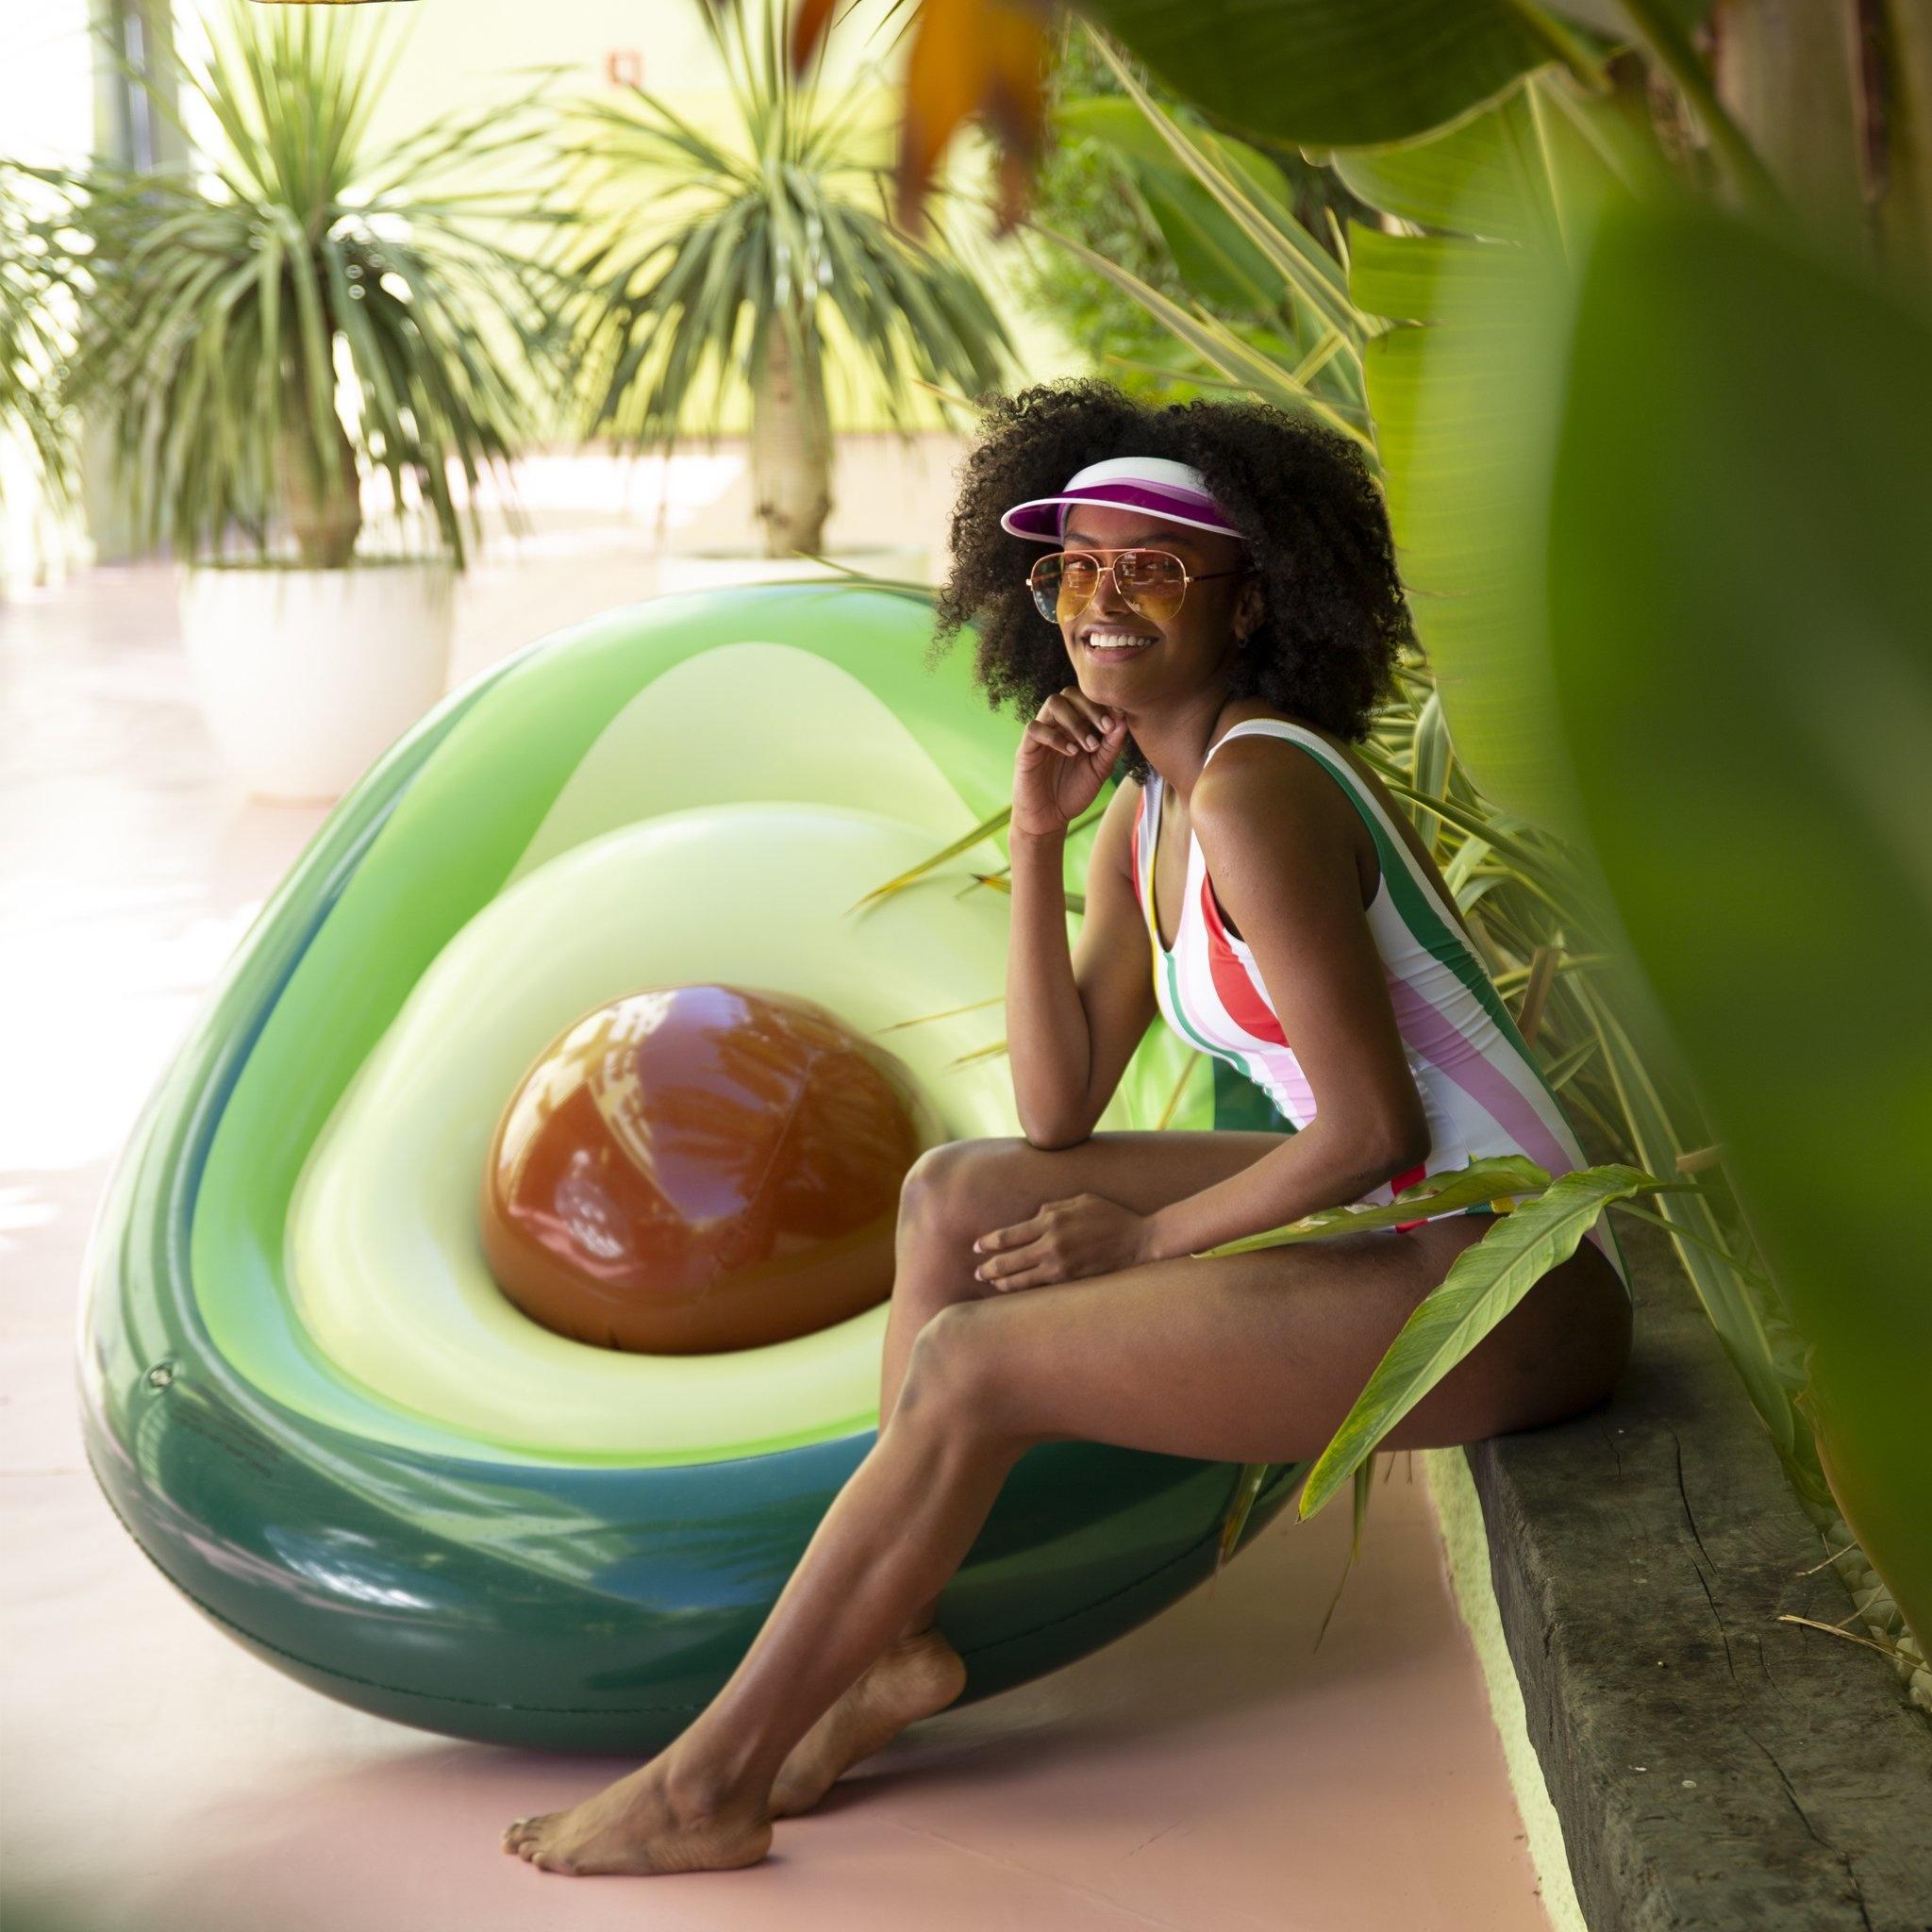 Swim Essentials OPBLAASBARE WATER LUCHTBED | GROOT LUCHTBED | ZWEMBAD SPEELGOED